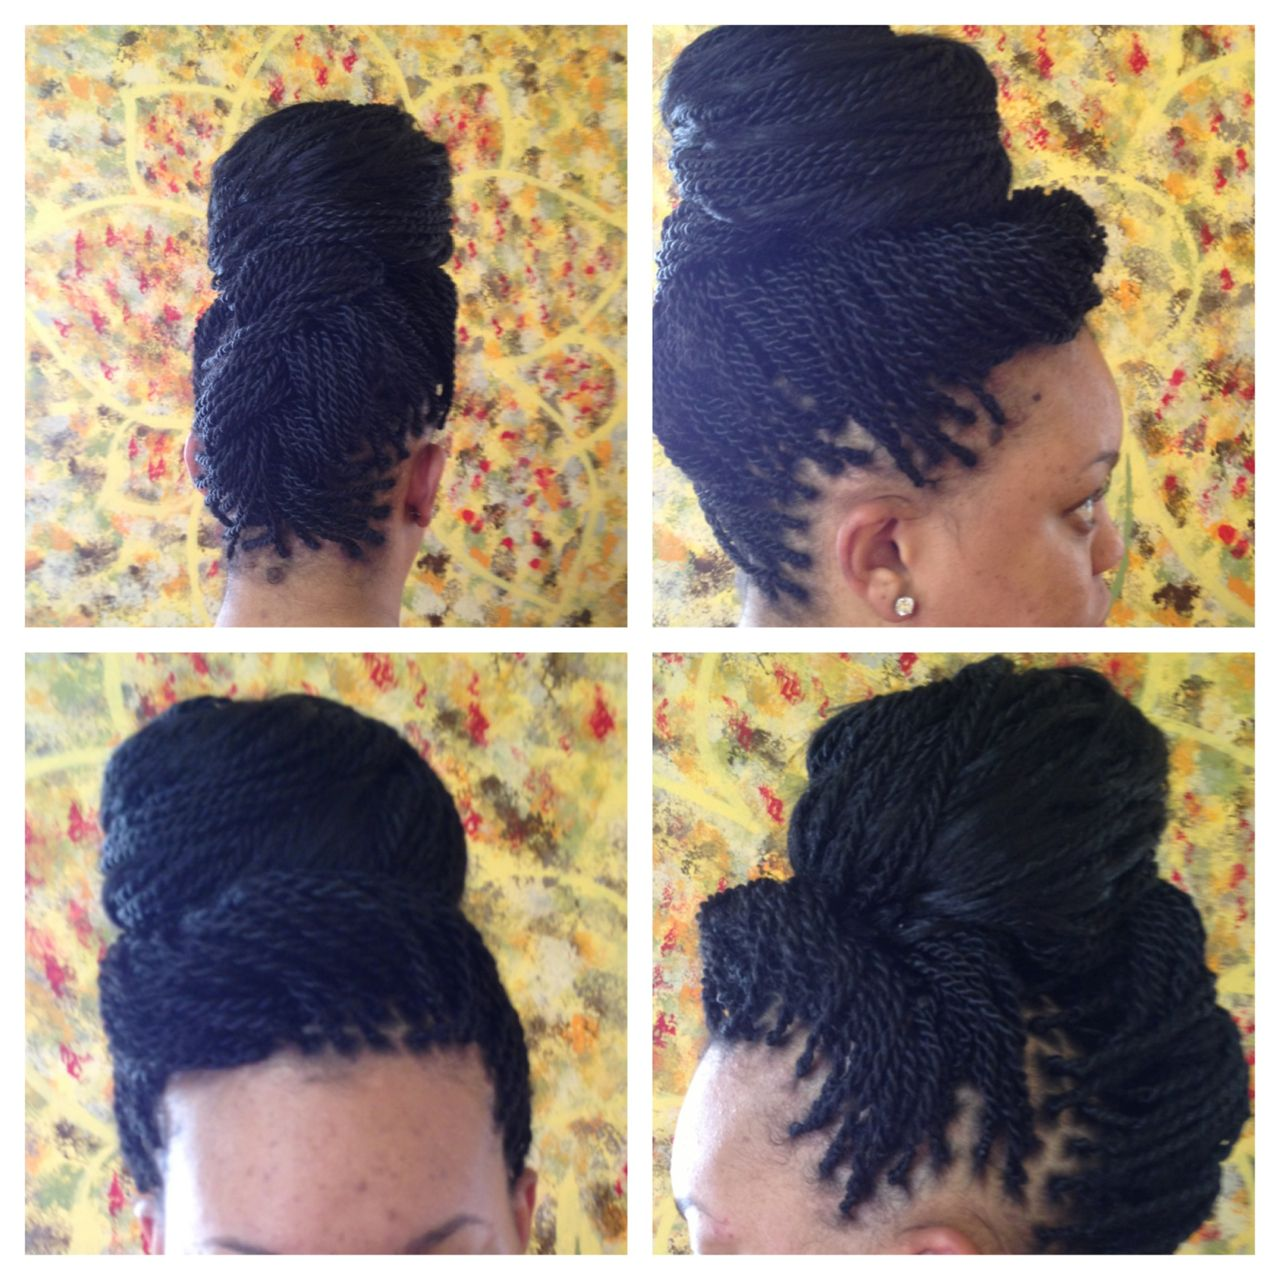 soulbeauti — senegalese twist in an updo | hair!!!! in 2019